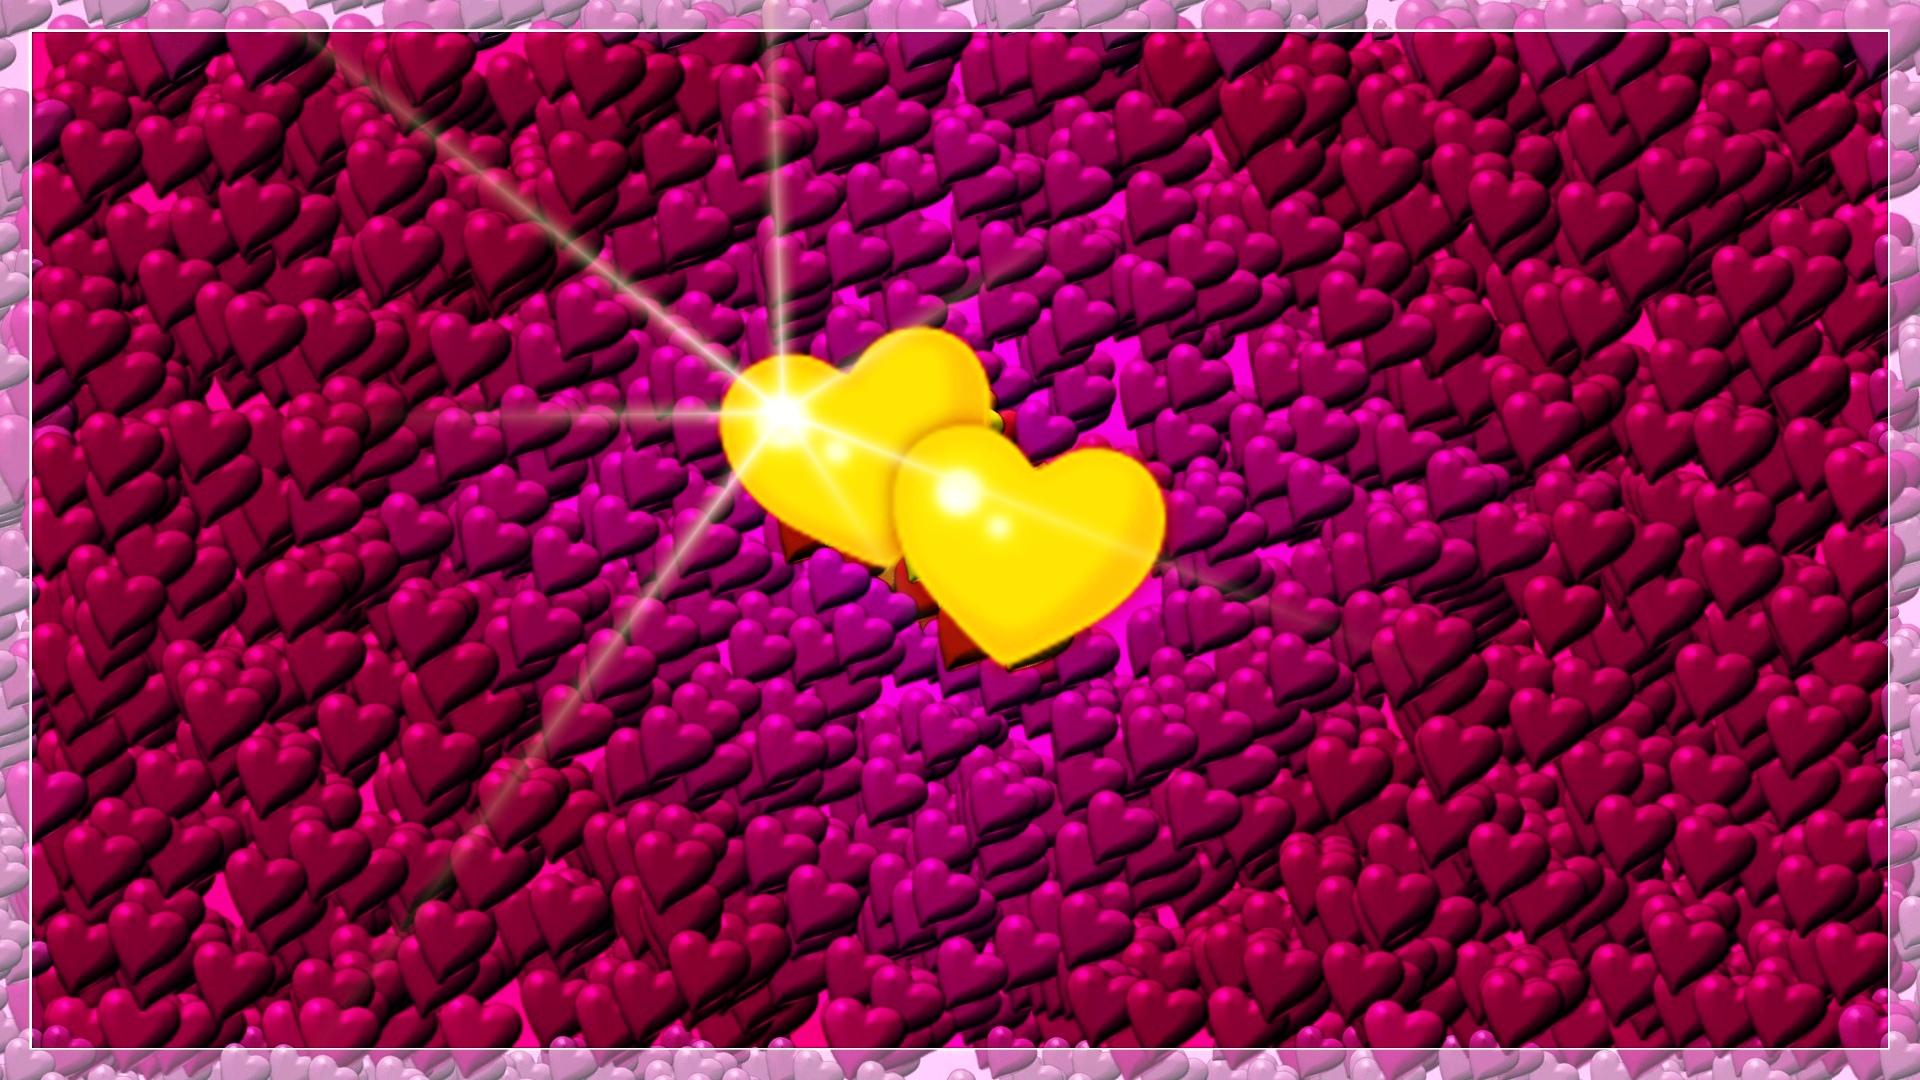 Wallpaper download free image search hd -  Free Heart Wallpaper Downloads 23 Free Wallpaper Hdlovewall Com